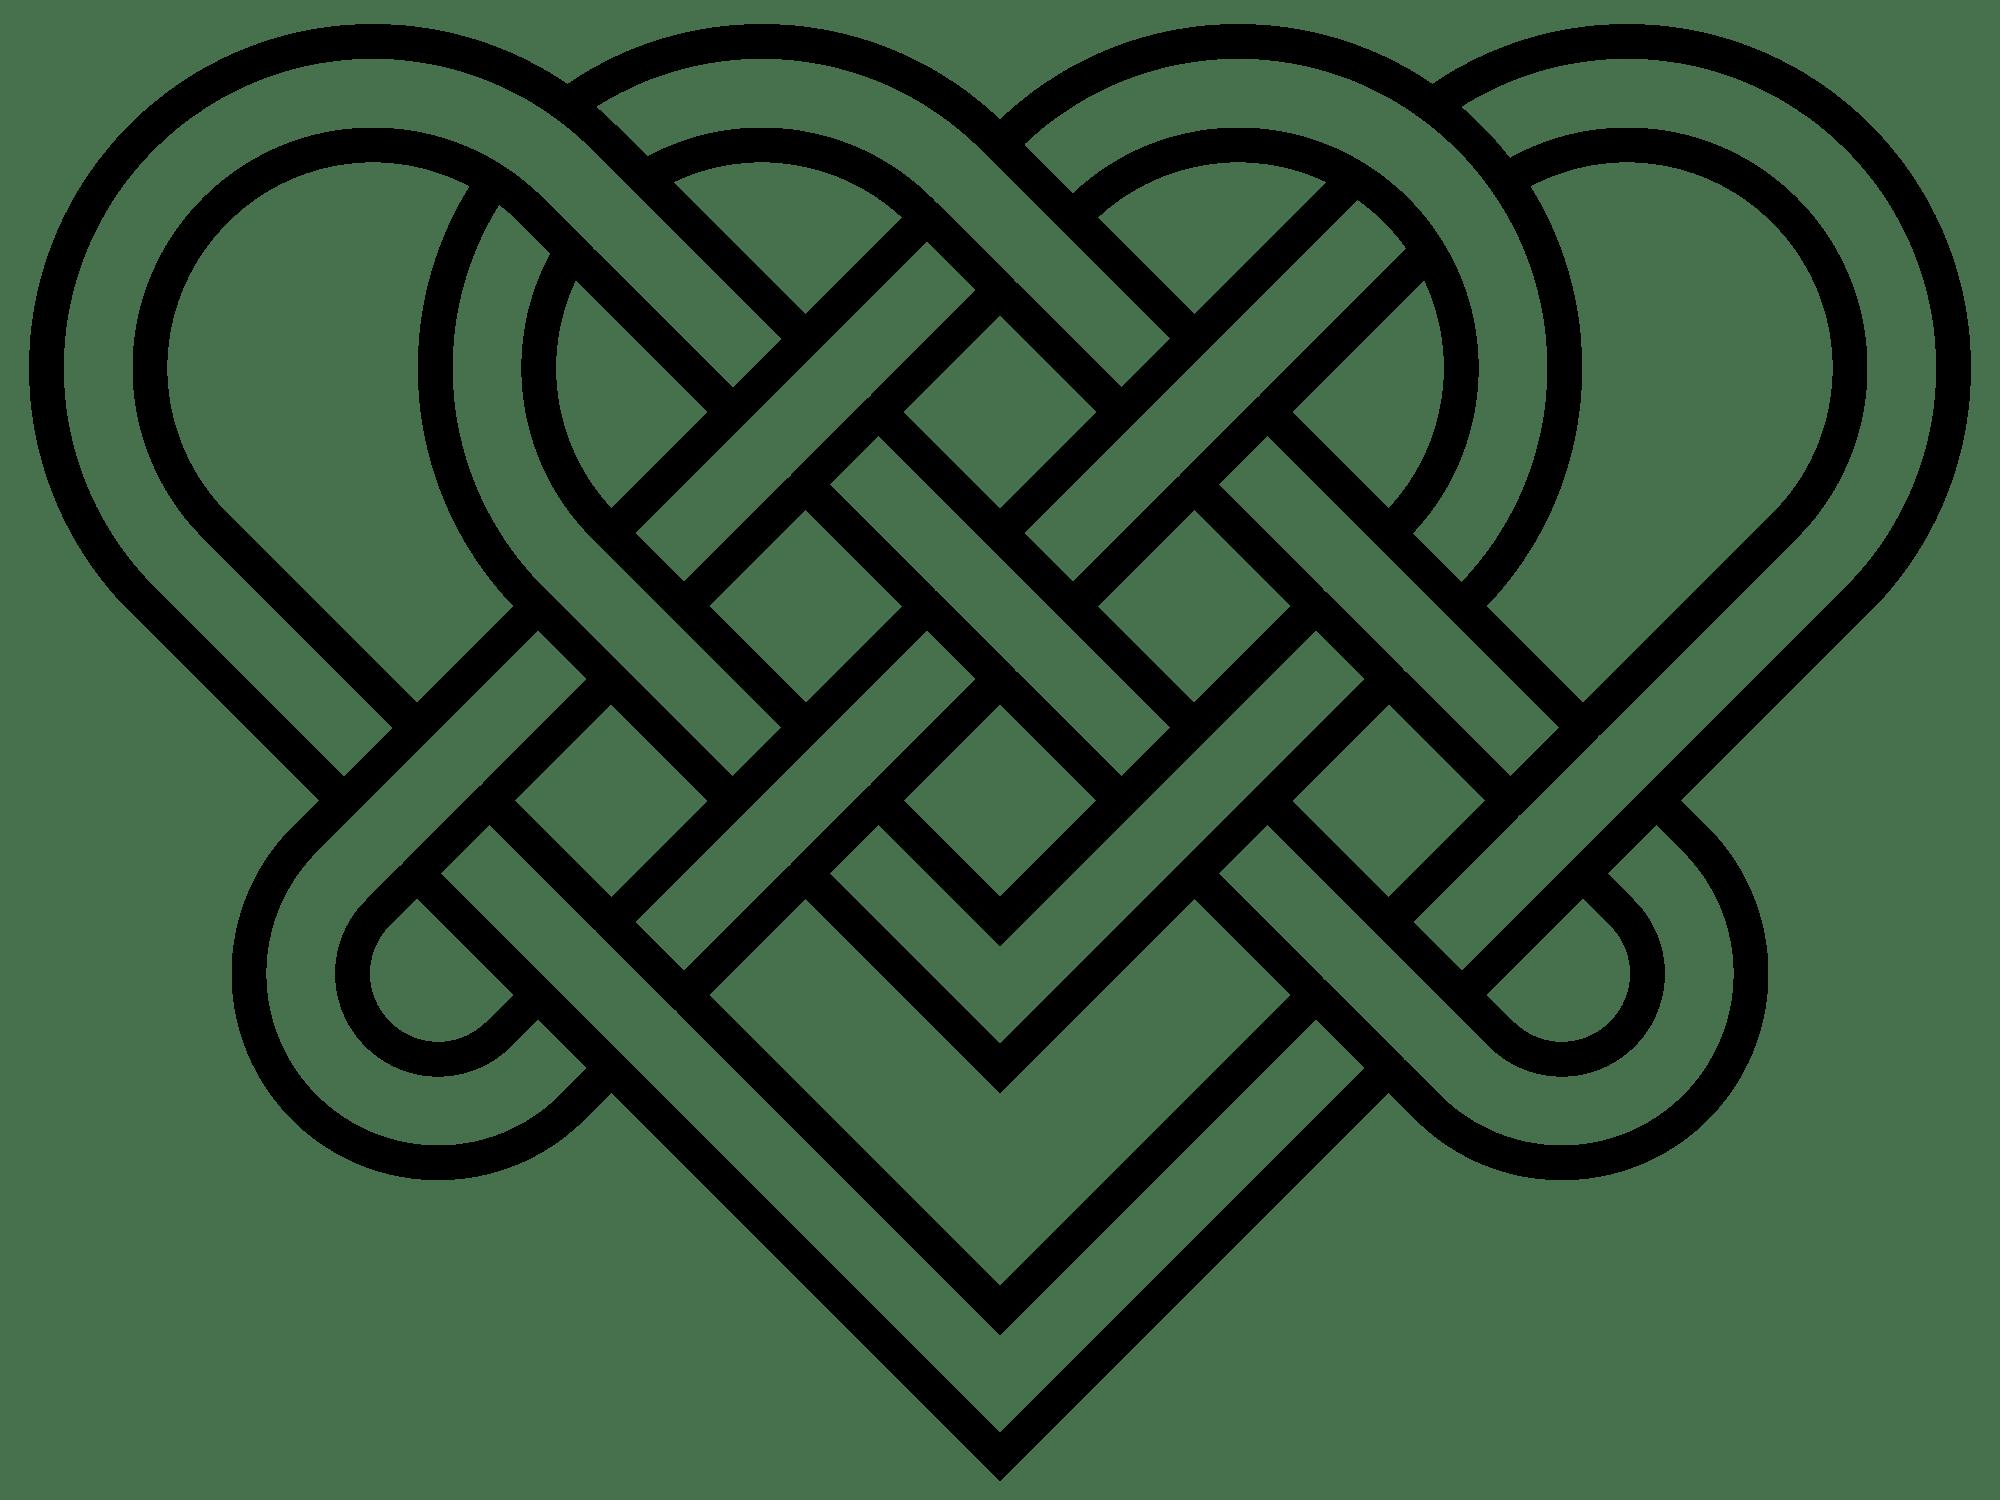 Celtic Knot PNG - 4199